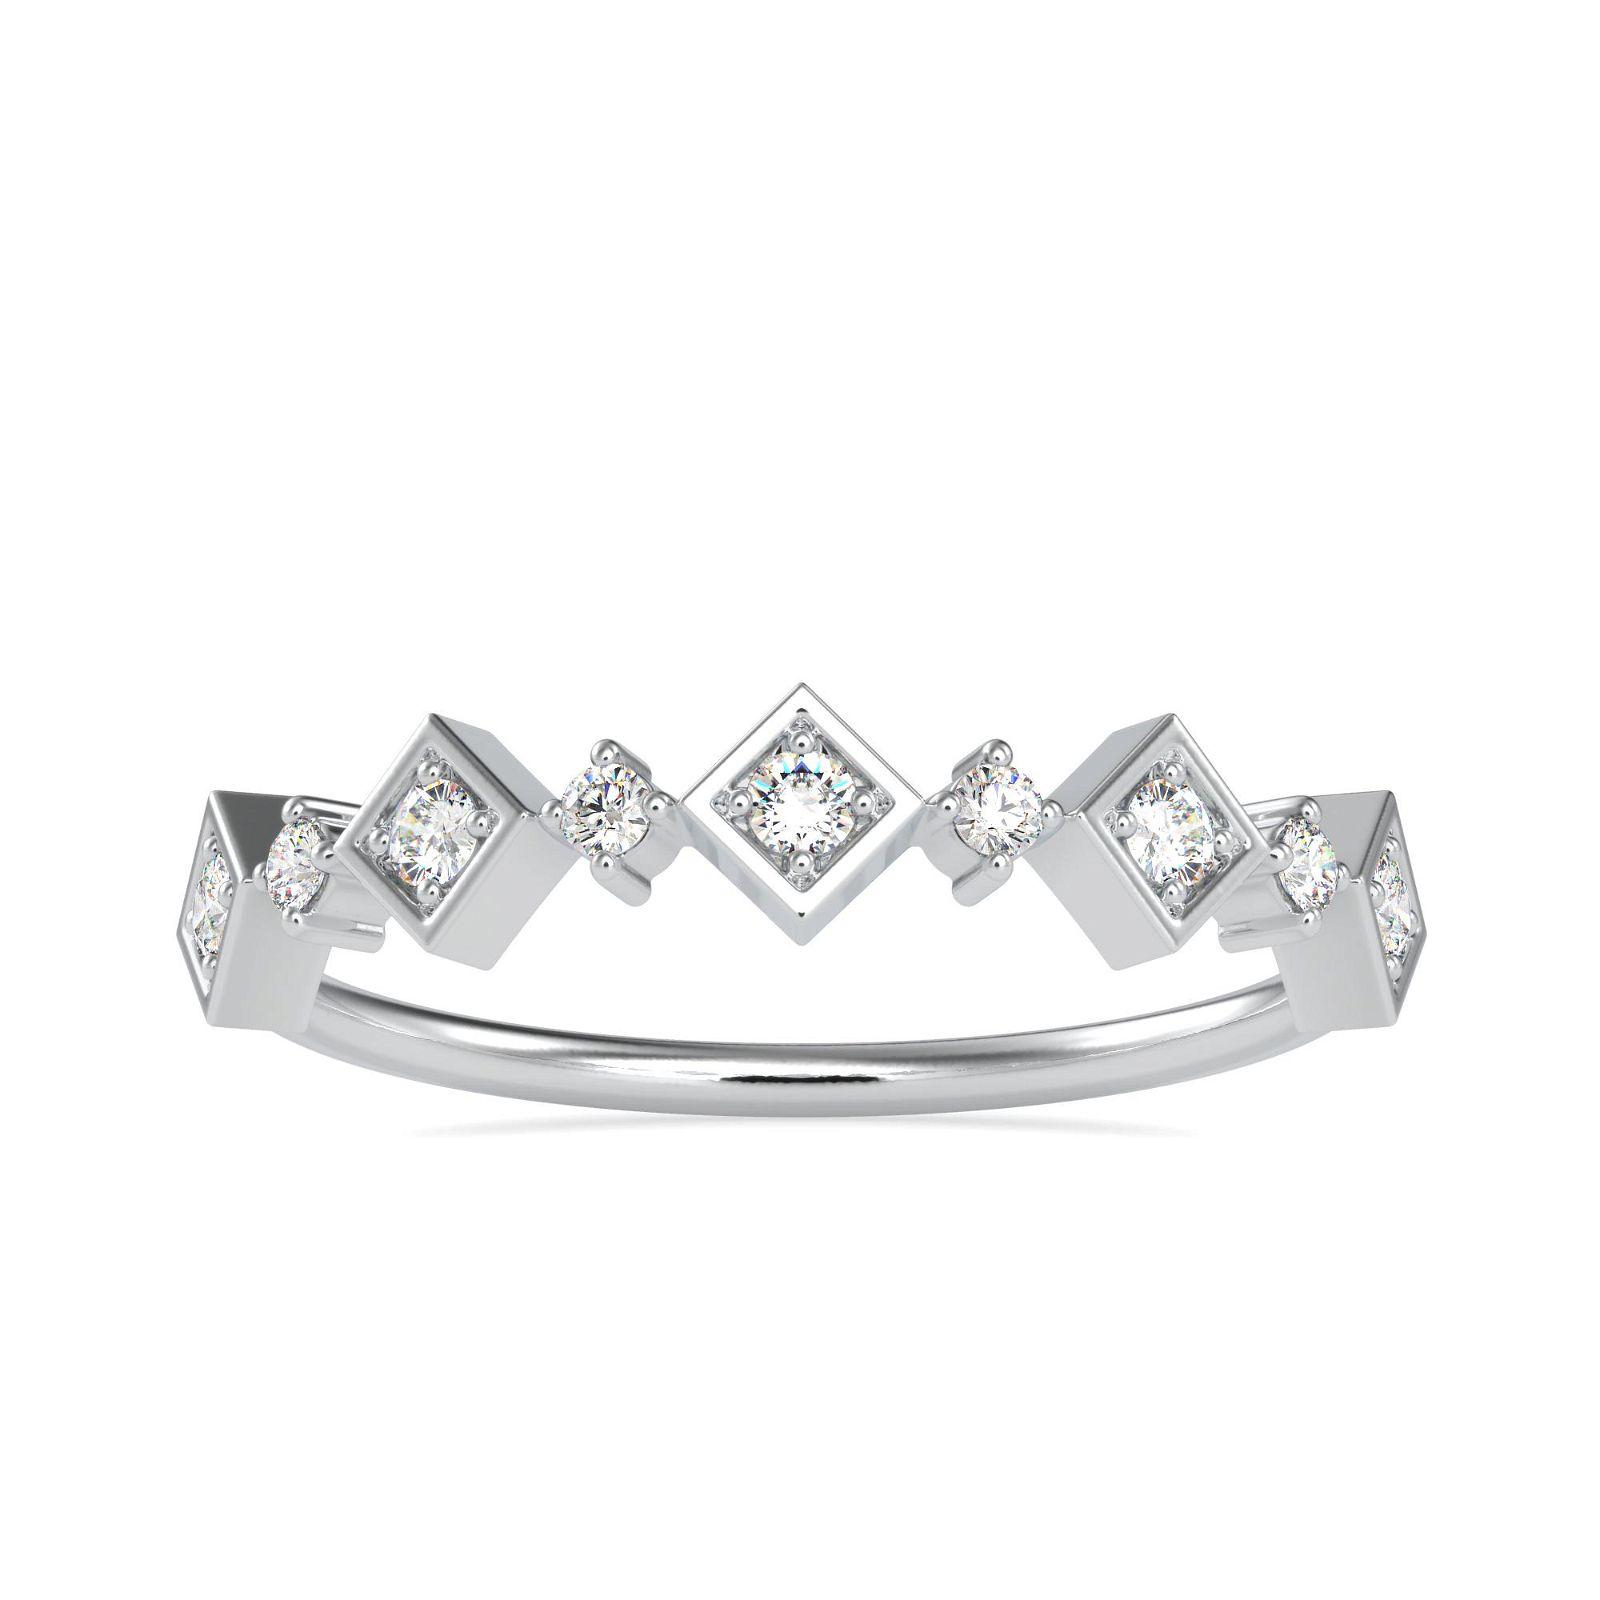 0.14CT Natural Diamond 14K White Gold Ring